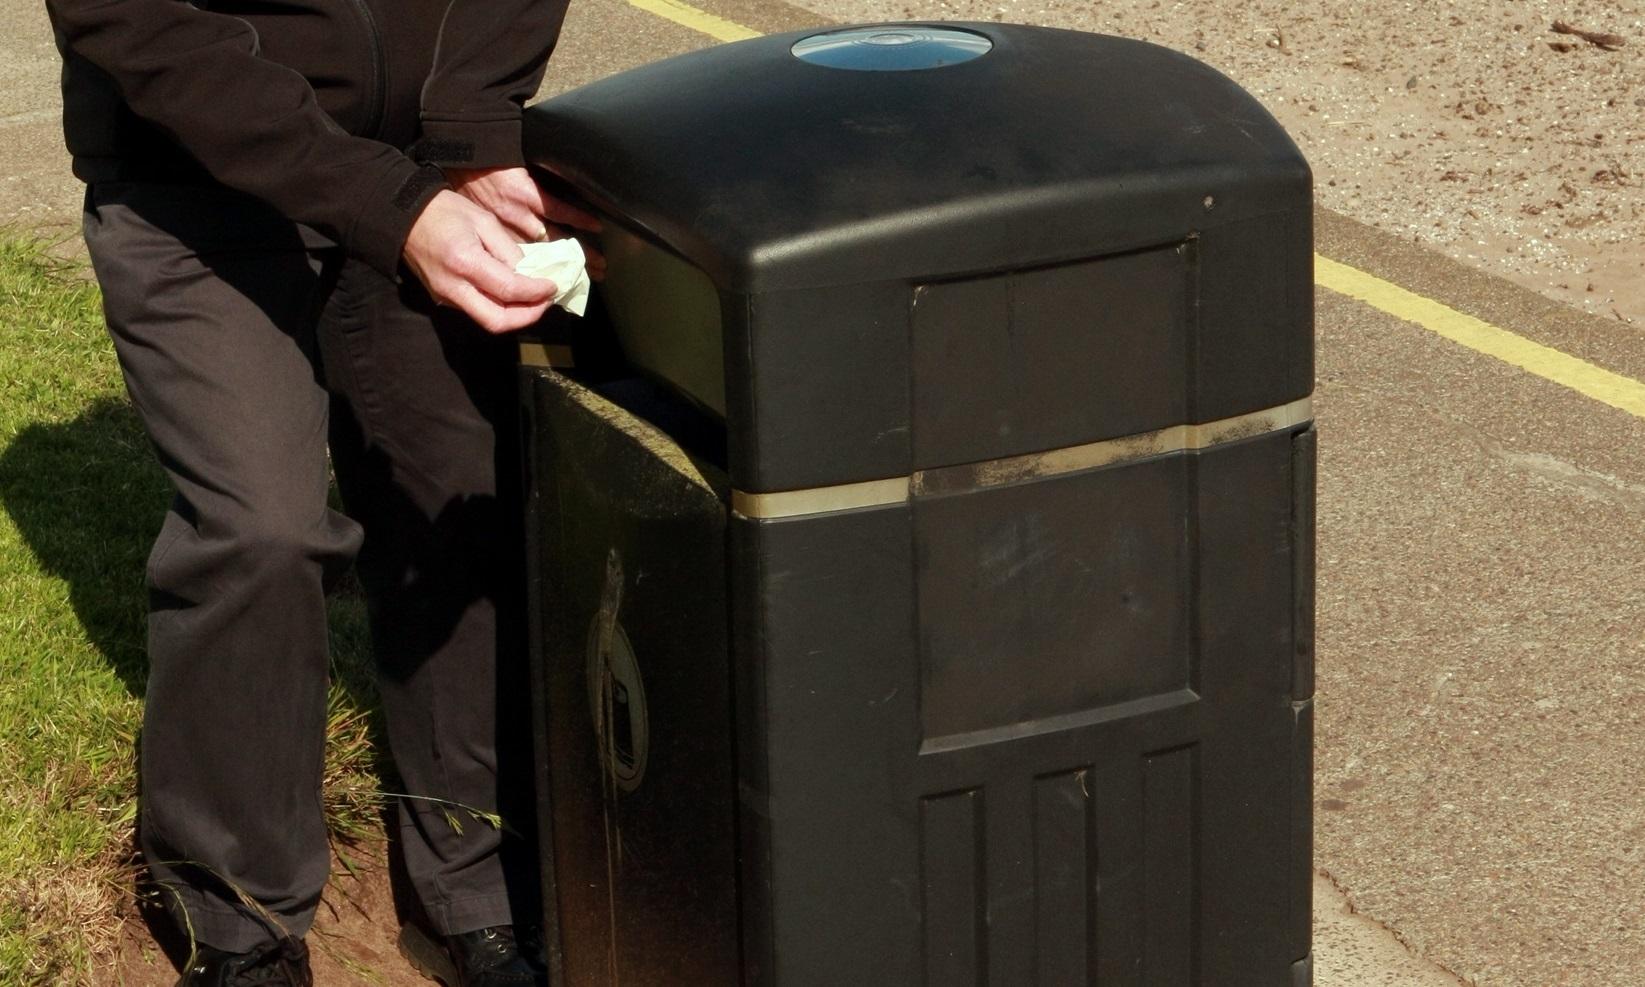 A street bin.